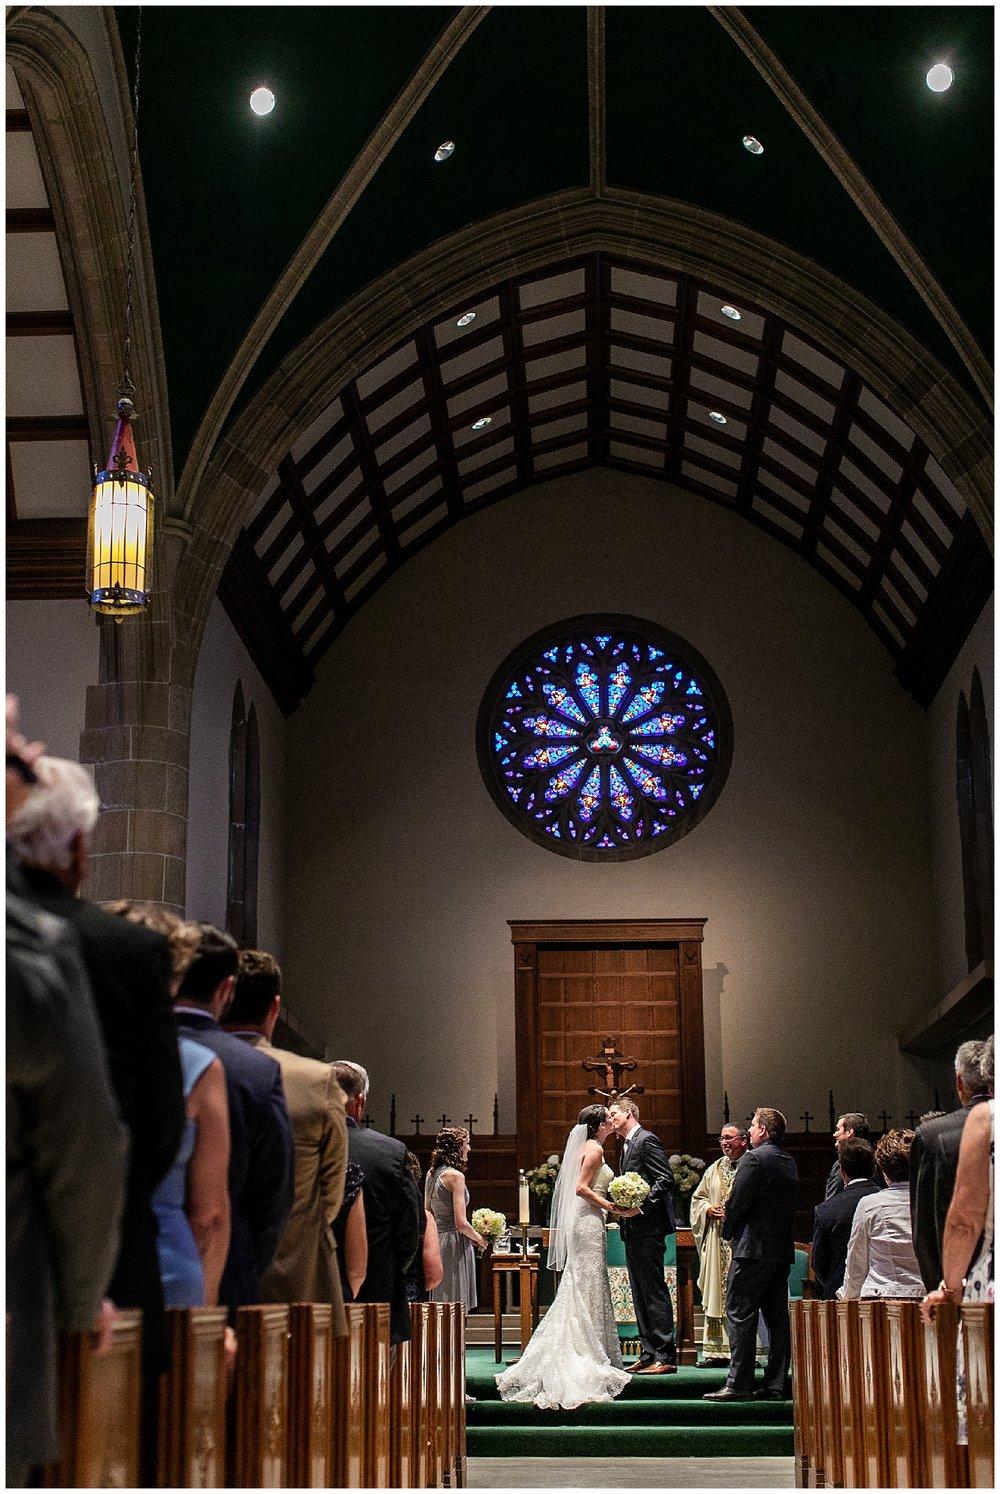 TracyPatrick-LoyolaCollege-PrestonHall-Wedding-LivingRadiantPhotography-photos_0048.jpg